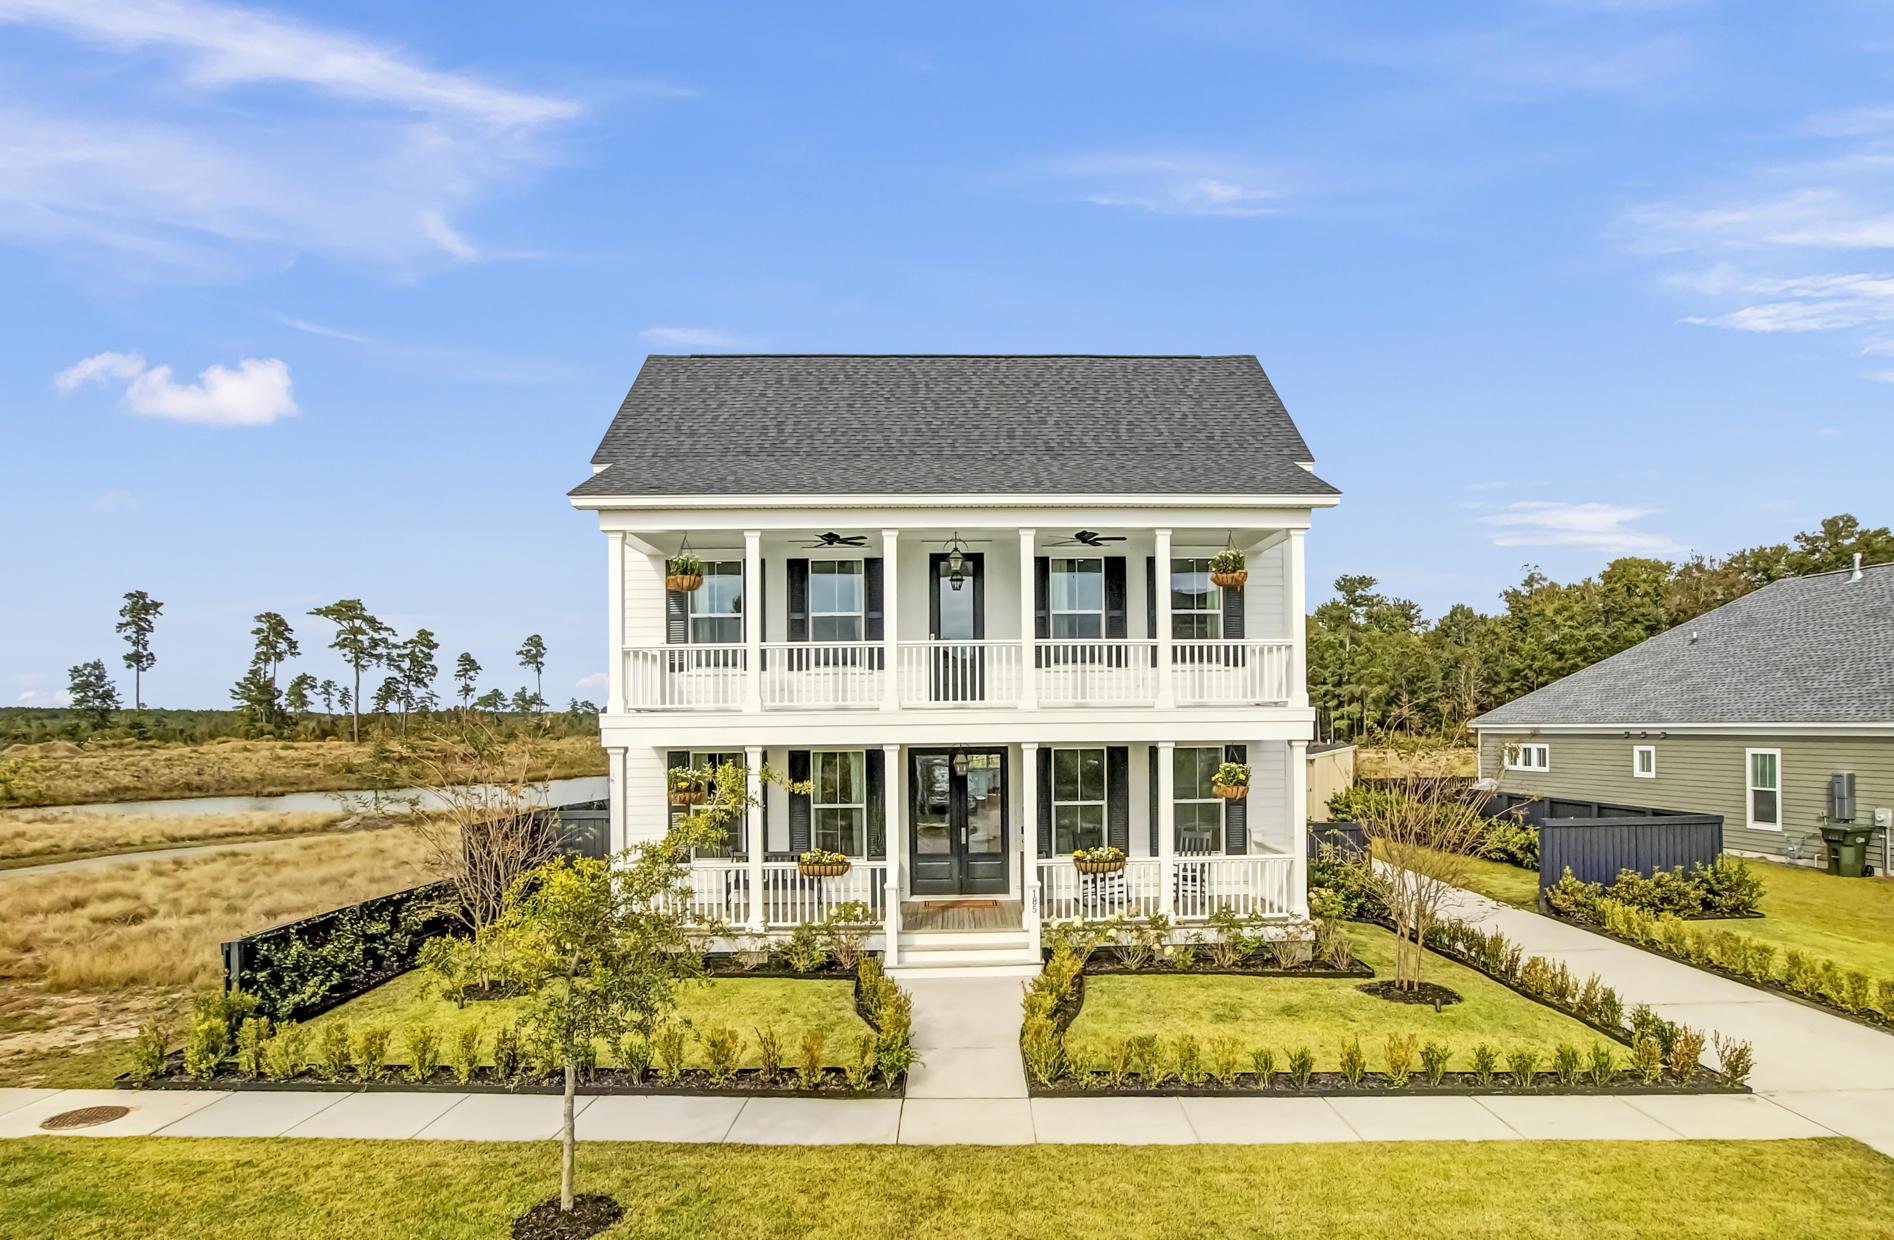 Carnes Crossroads Homes For Sale - 185 Callibluff, Summerville, SC - 7